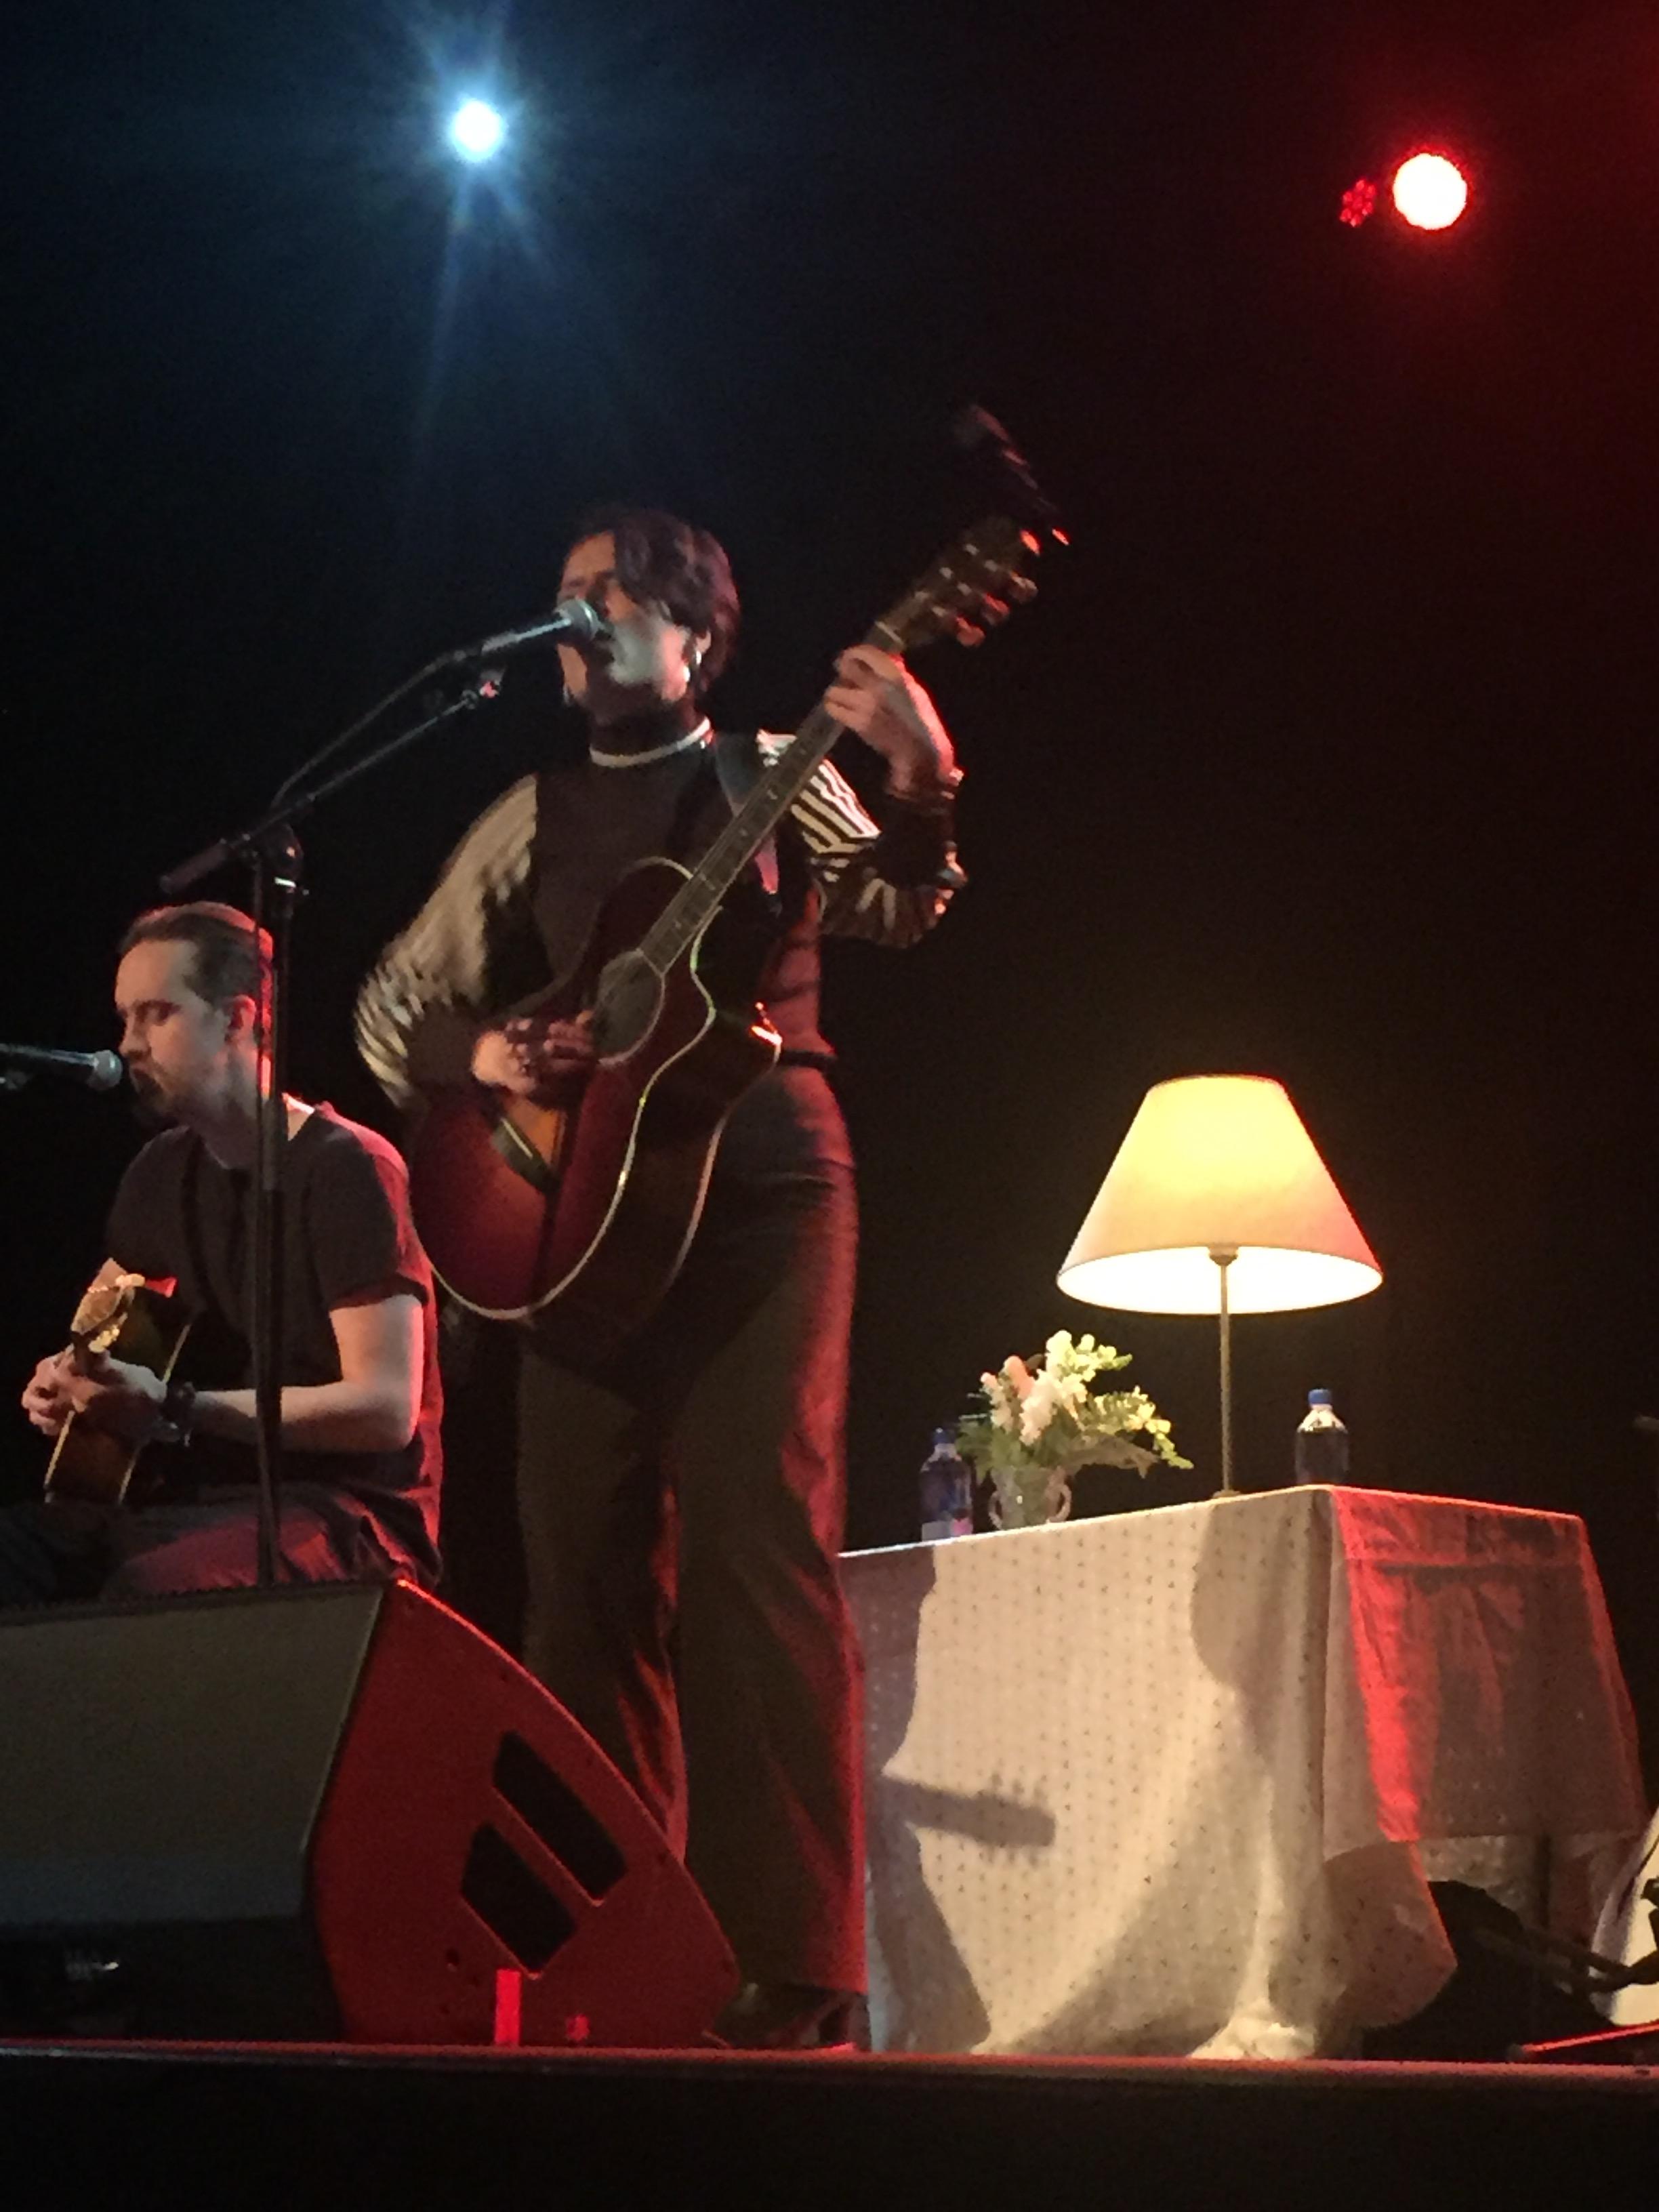 Emily King You and I Tour 2017